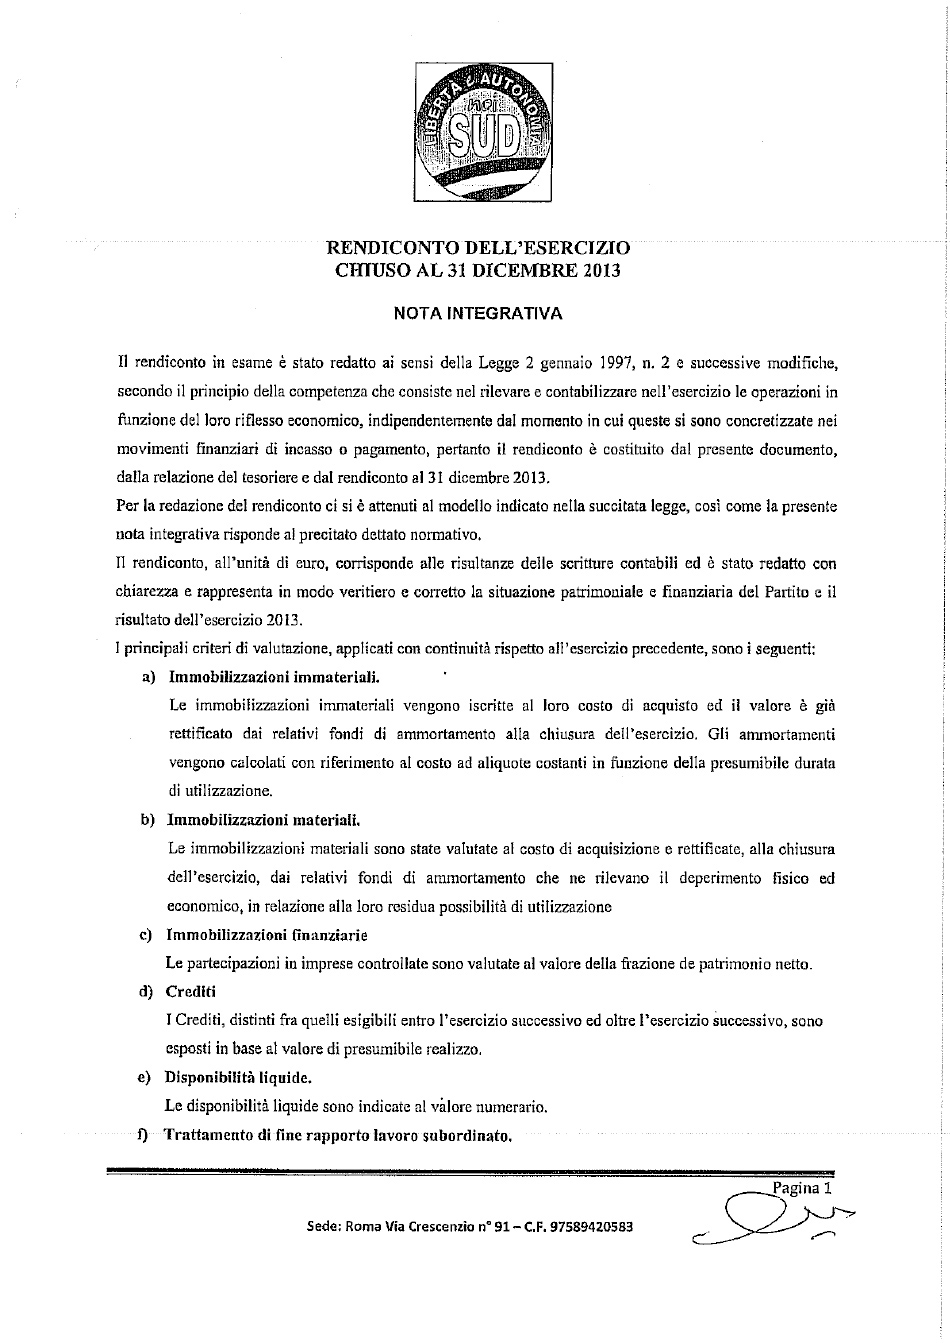 nota integrativa bilancio 2013-1